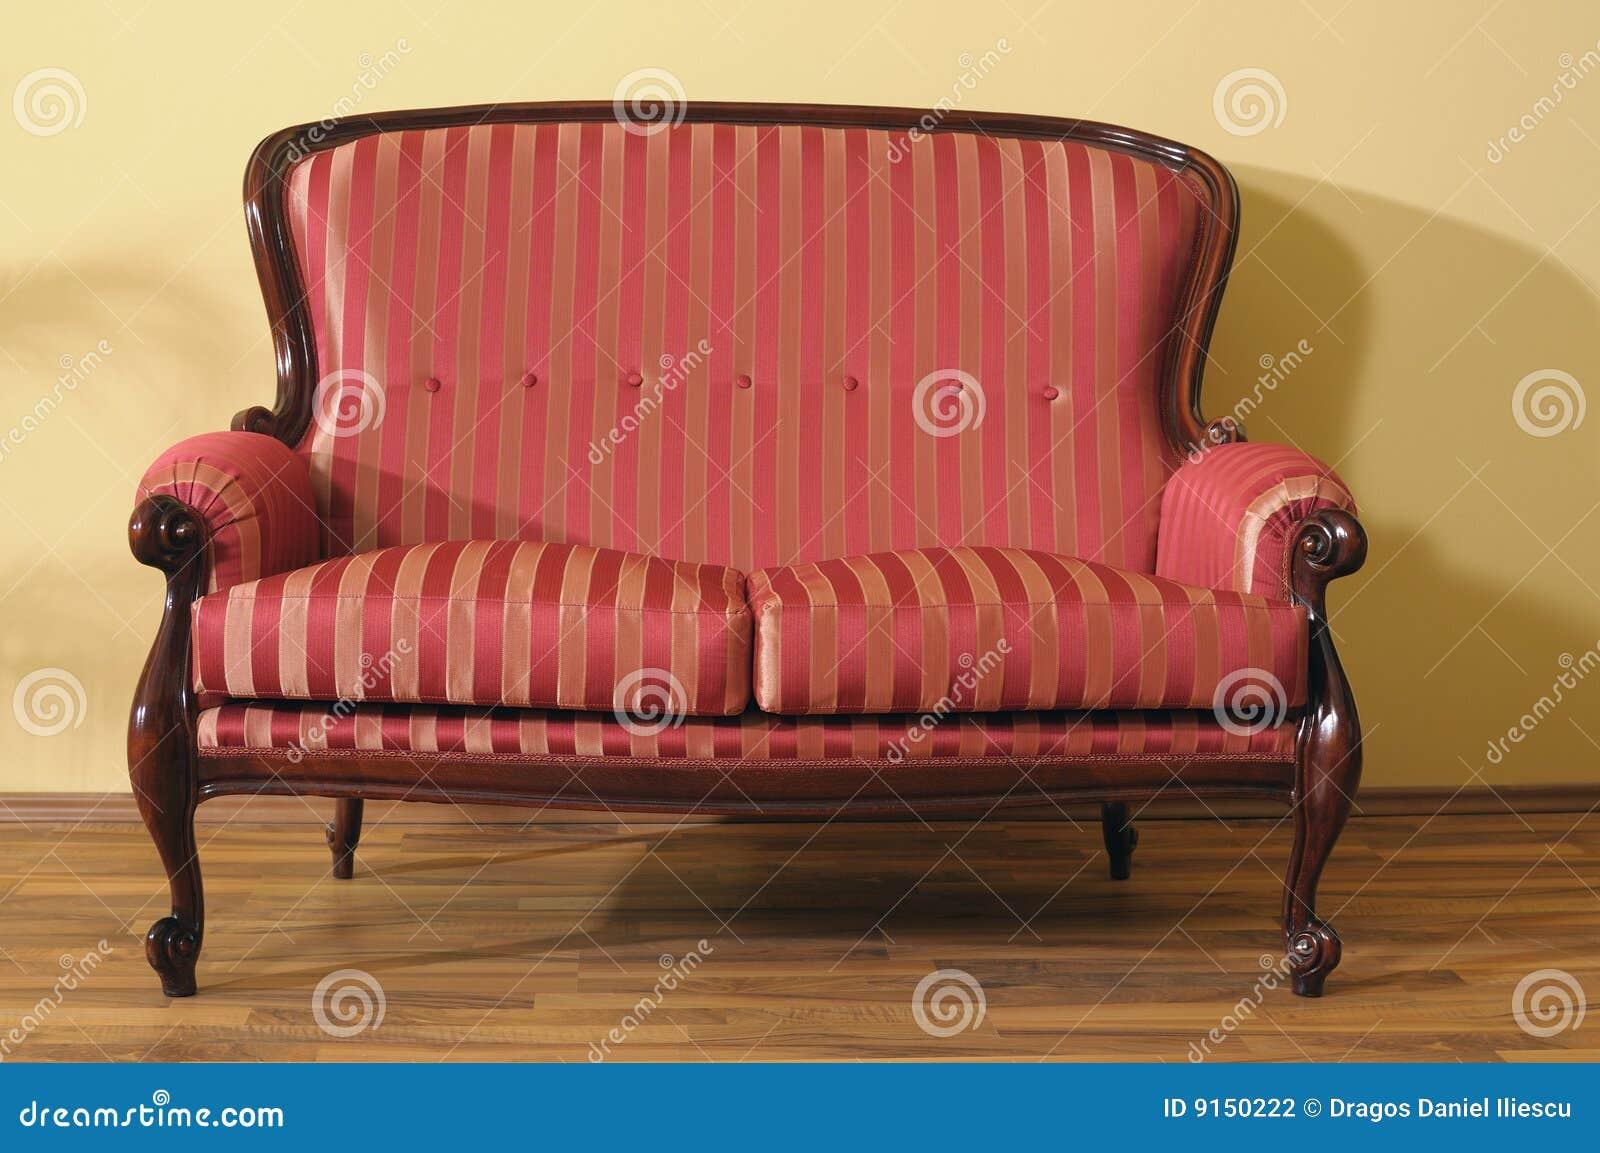 beautiful sofa isolated in modern room